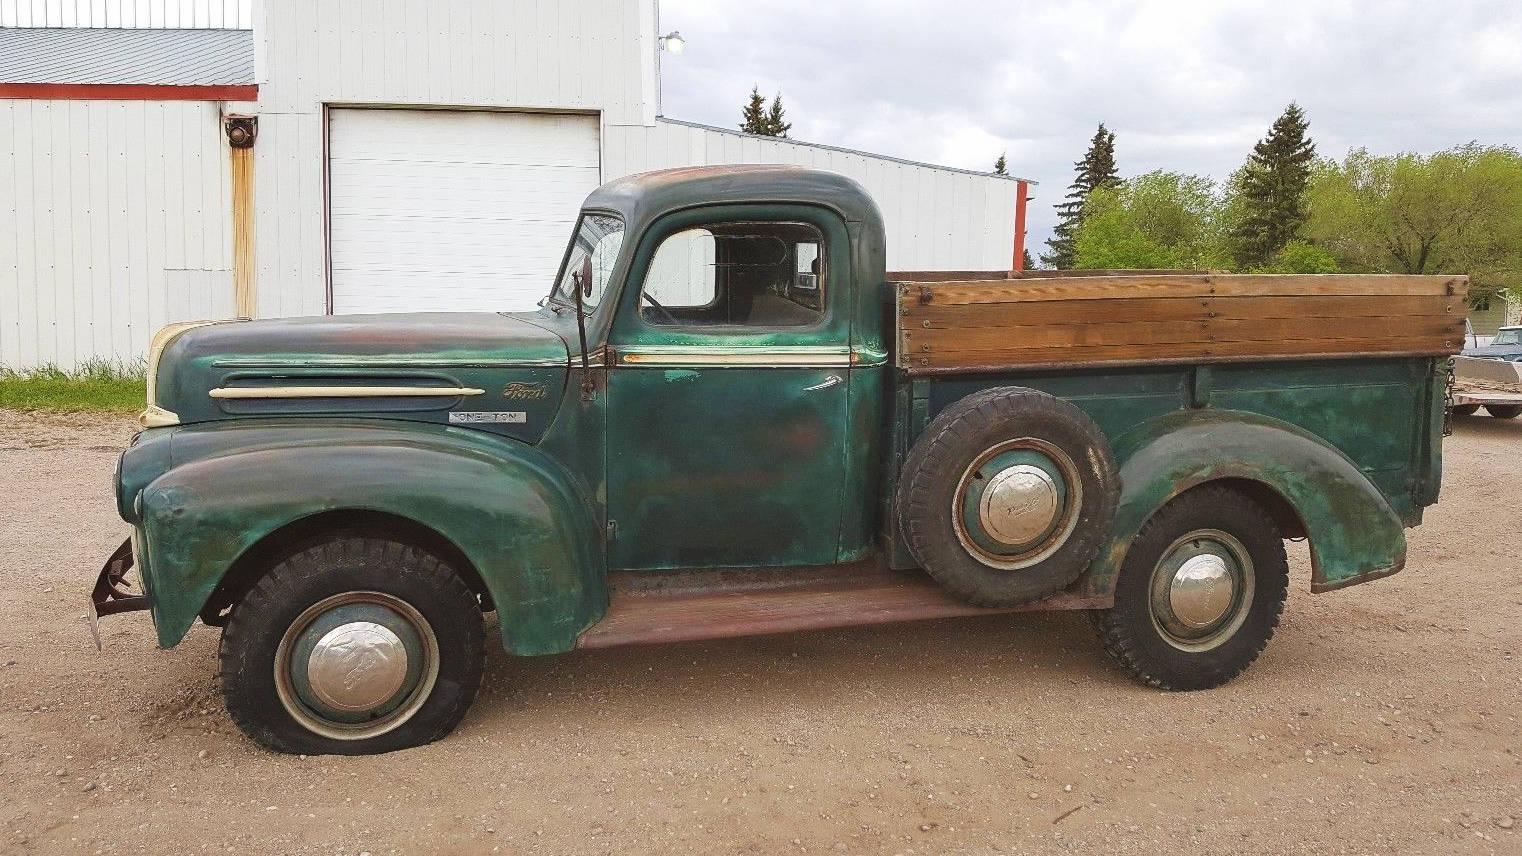 north dakota survivor 1946 ford one ton truck. Black Bedroom Furniture Sets. Home Design Ideas